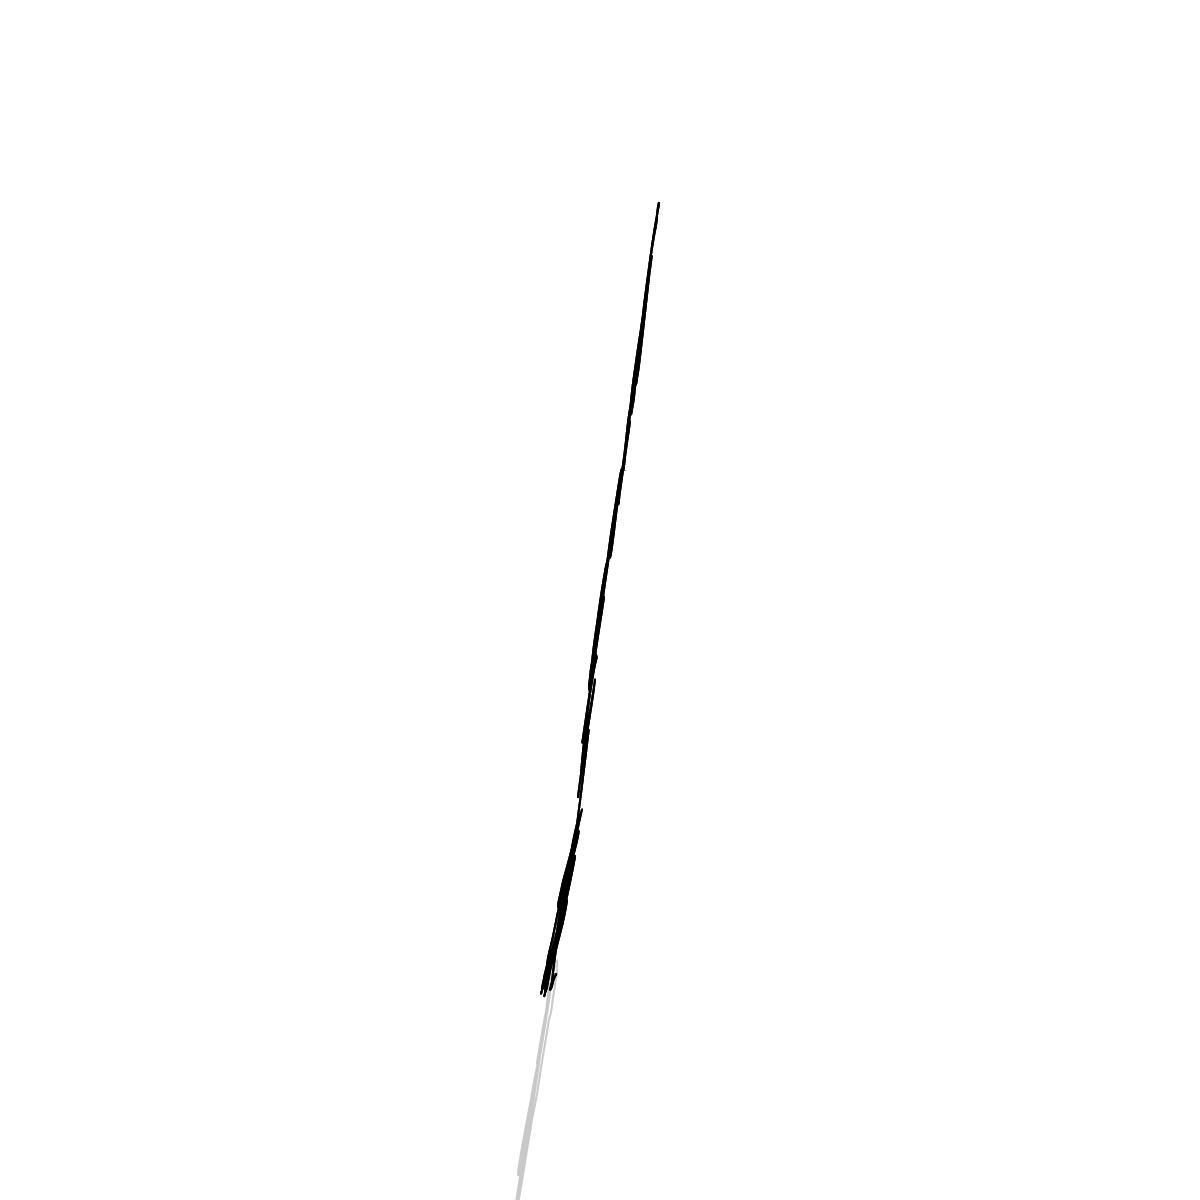 BAAAM drawing#16720 lat:40.7132644653320300lng: -74.0124816894531200